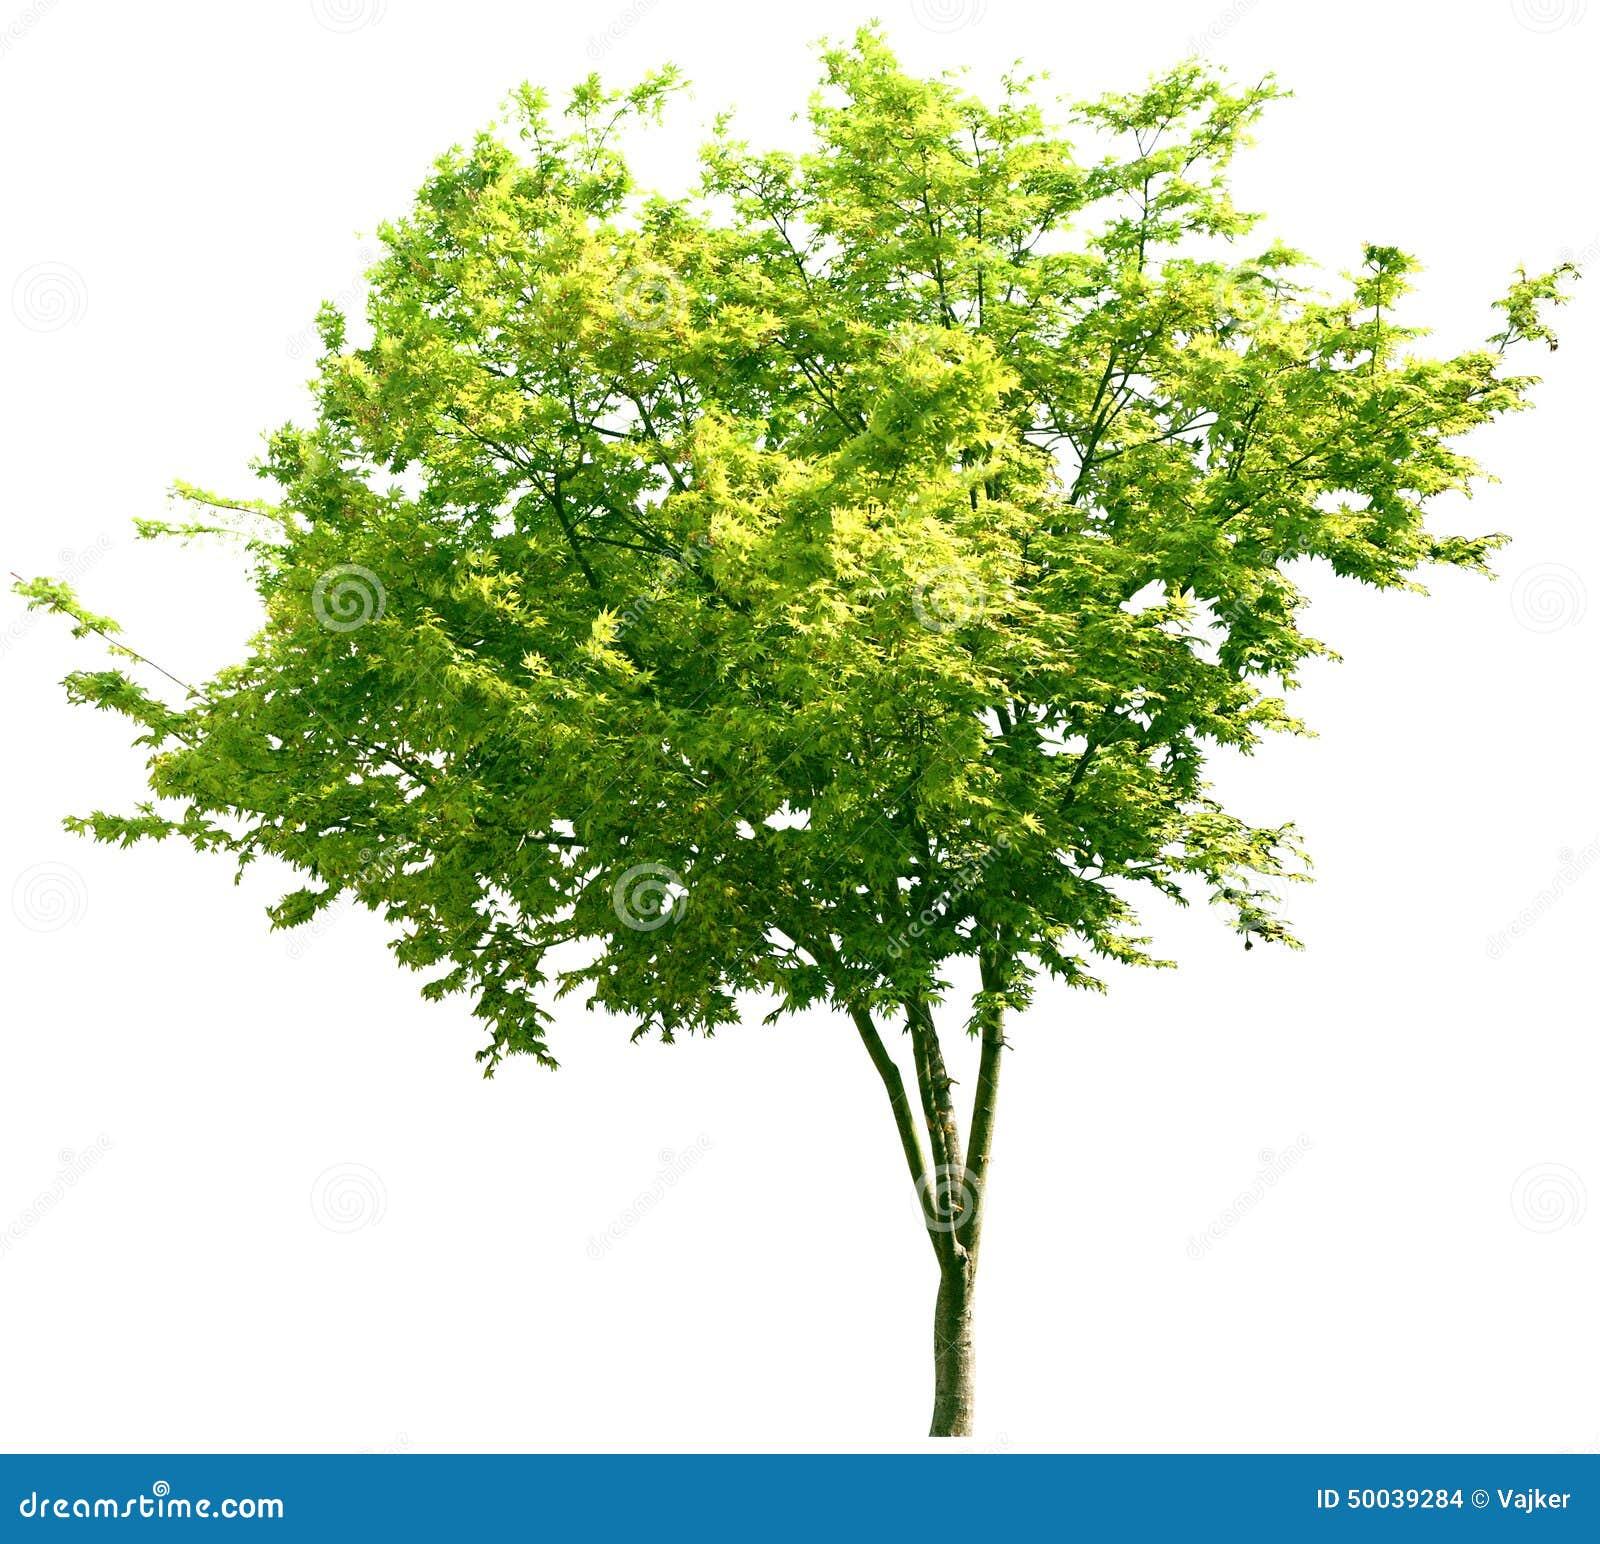 Tree oak plants nature green summer leafy greenery stock photo image 50039284 - Leafy houseplants ...